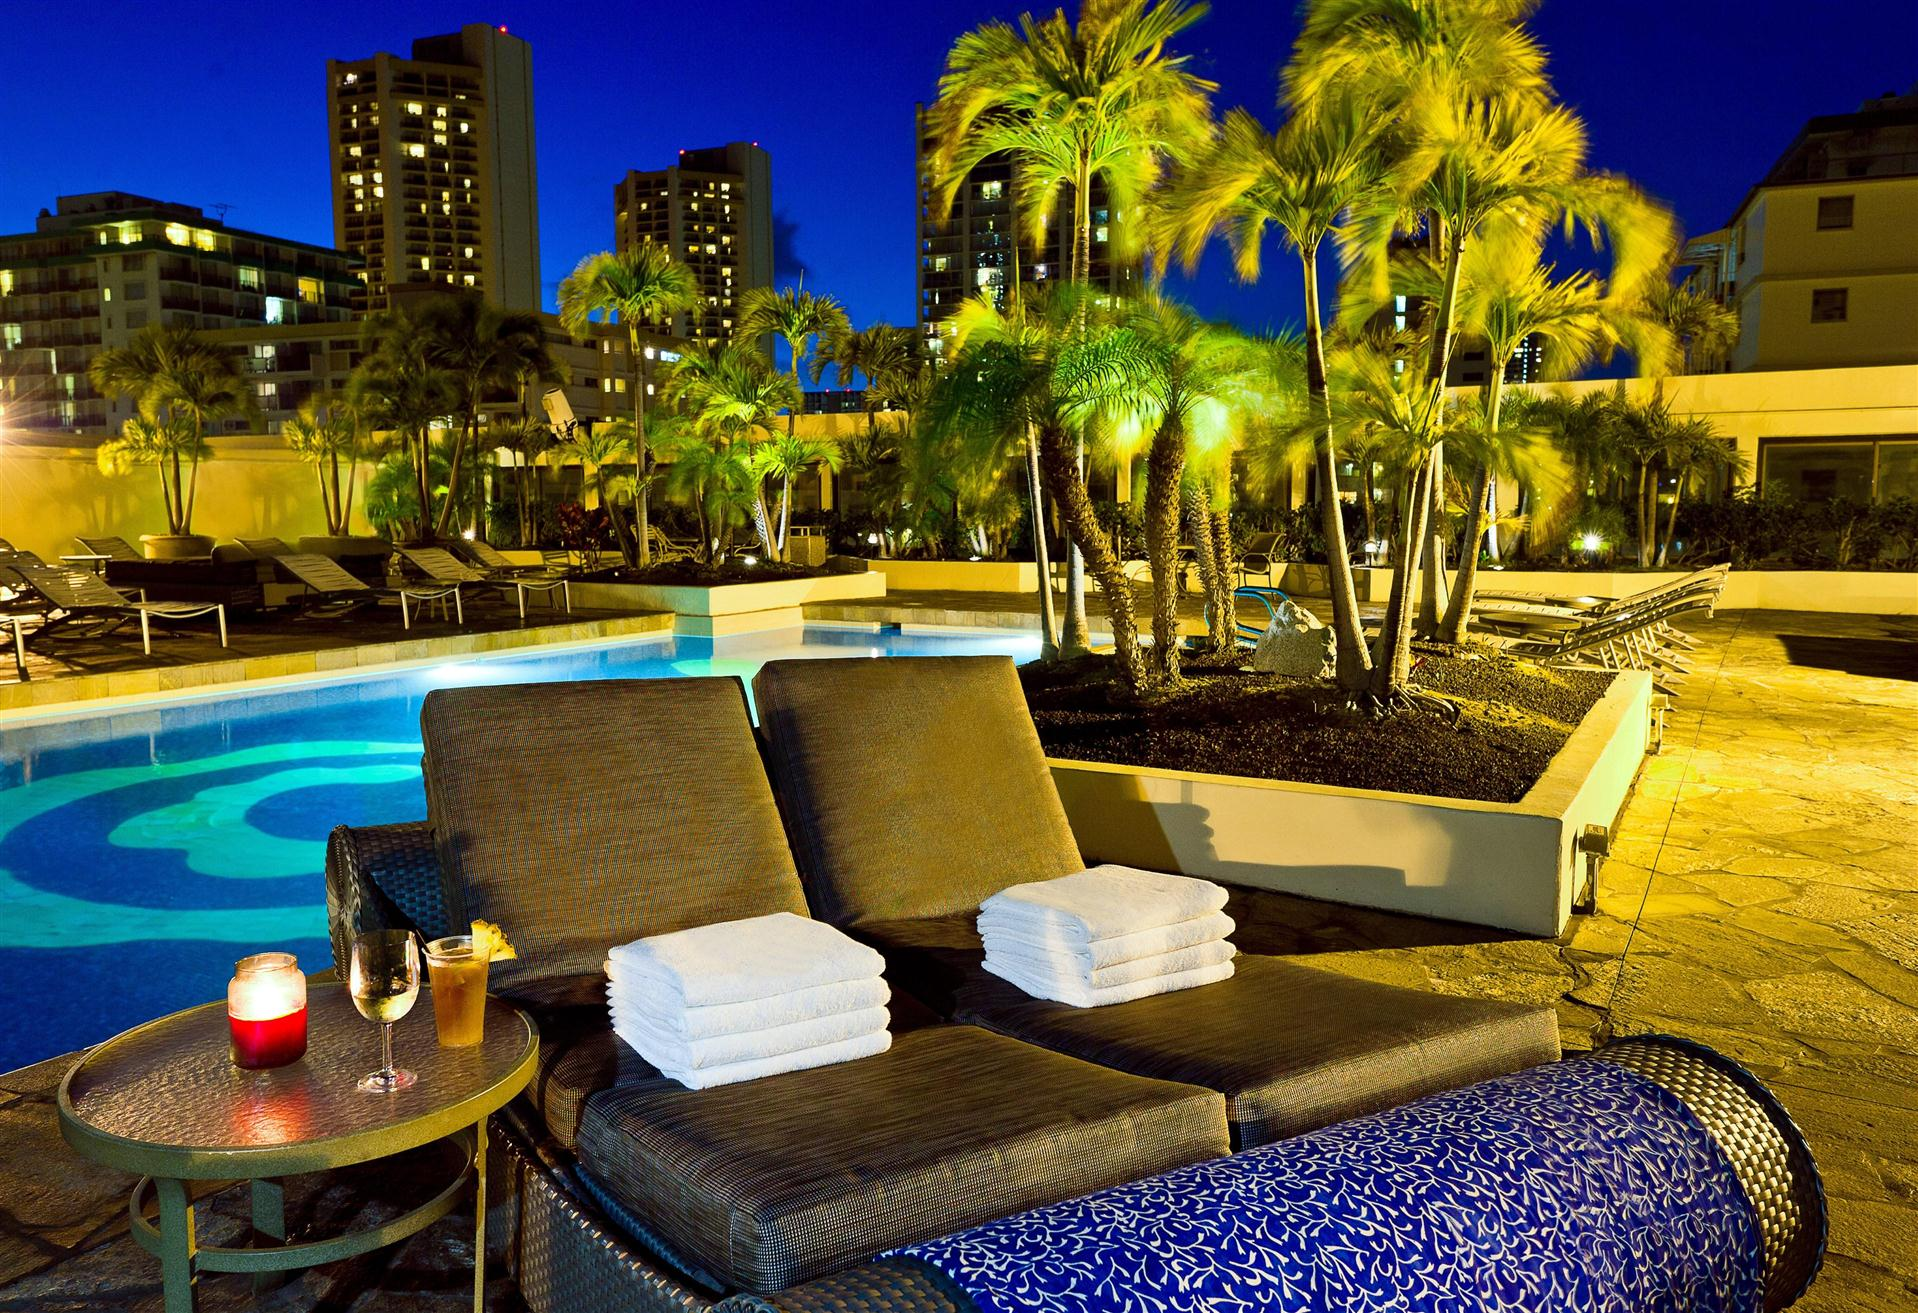 Meetings and Events at Hilton Waikiki Beach, Honolulu, HI, US